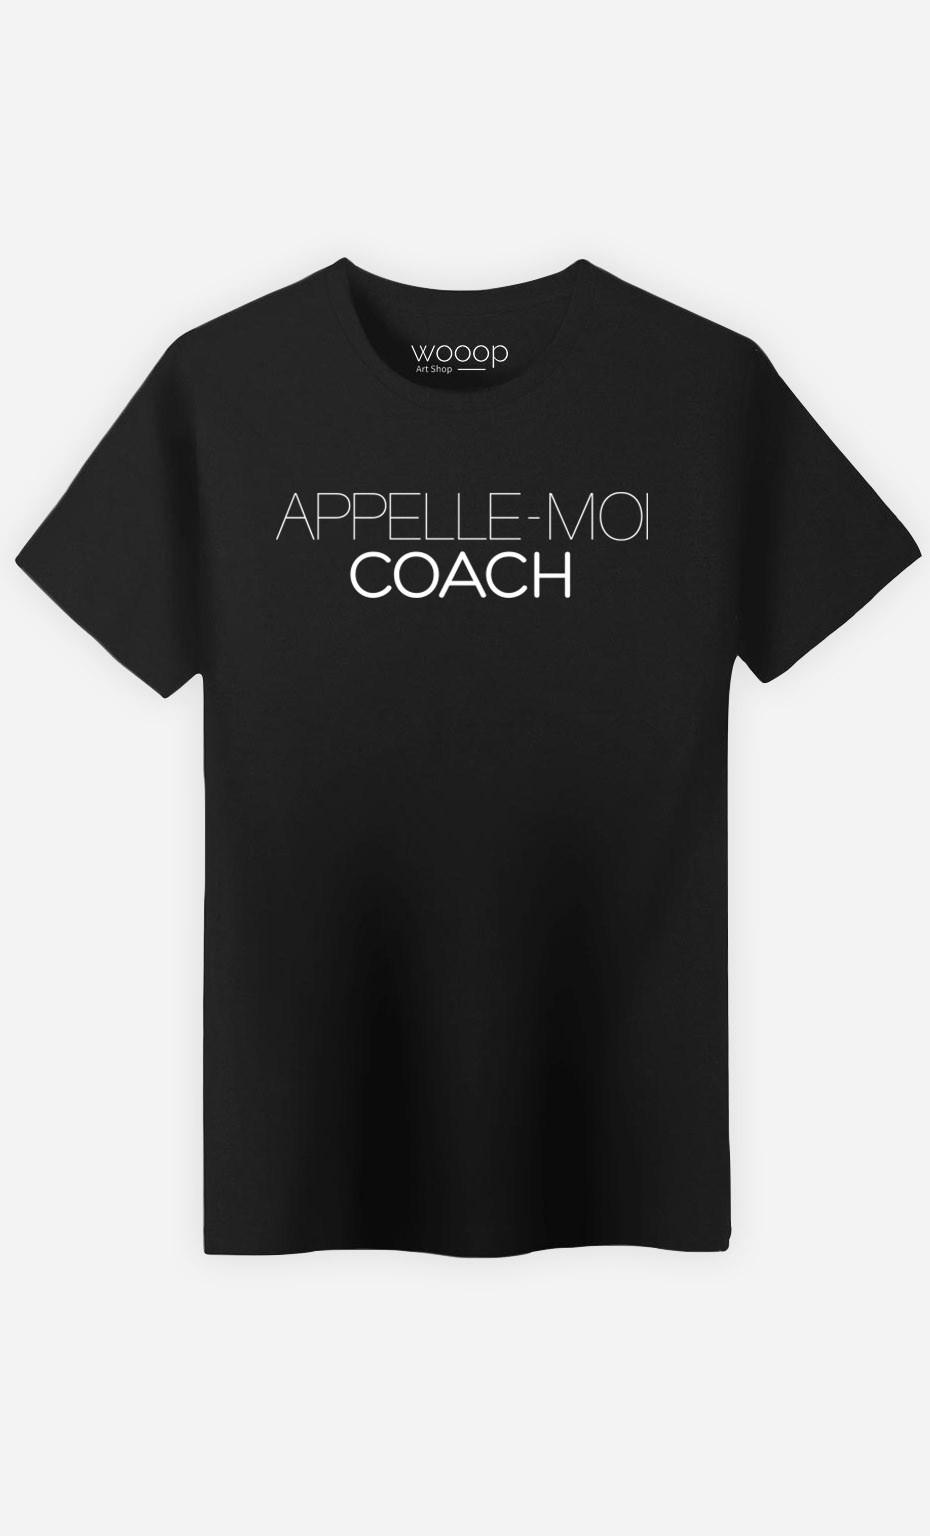 T-Shirt Appelle-Moi Coach